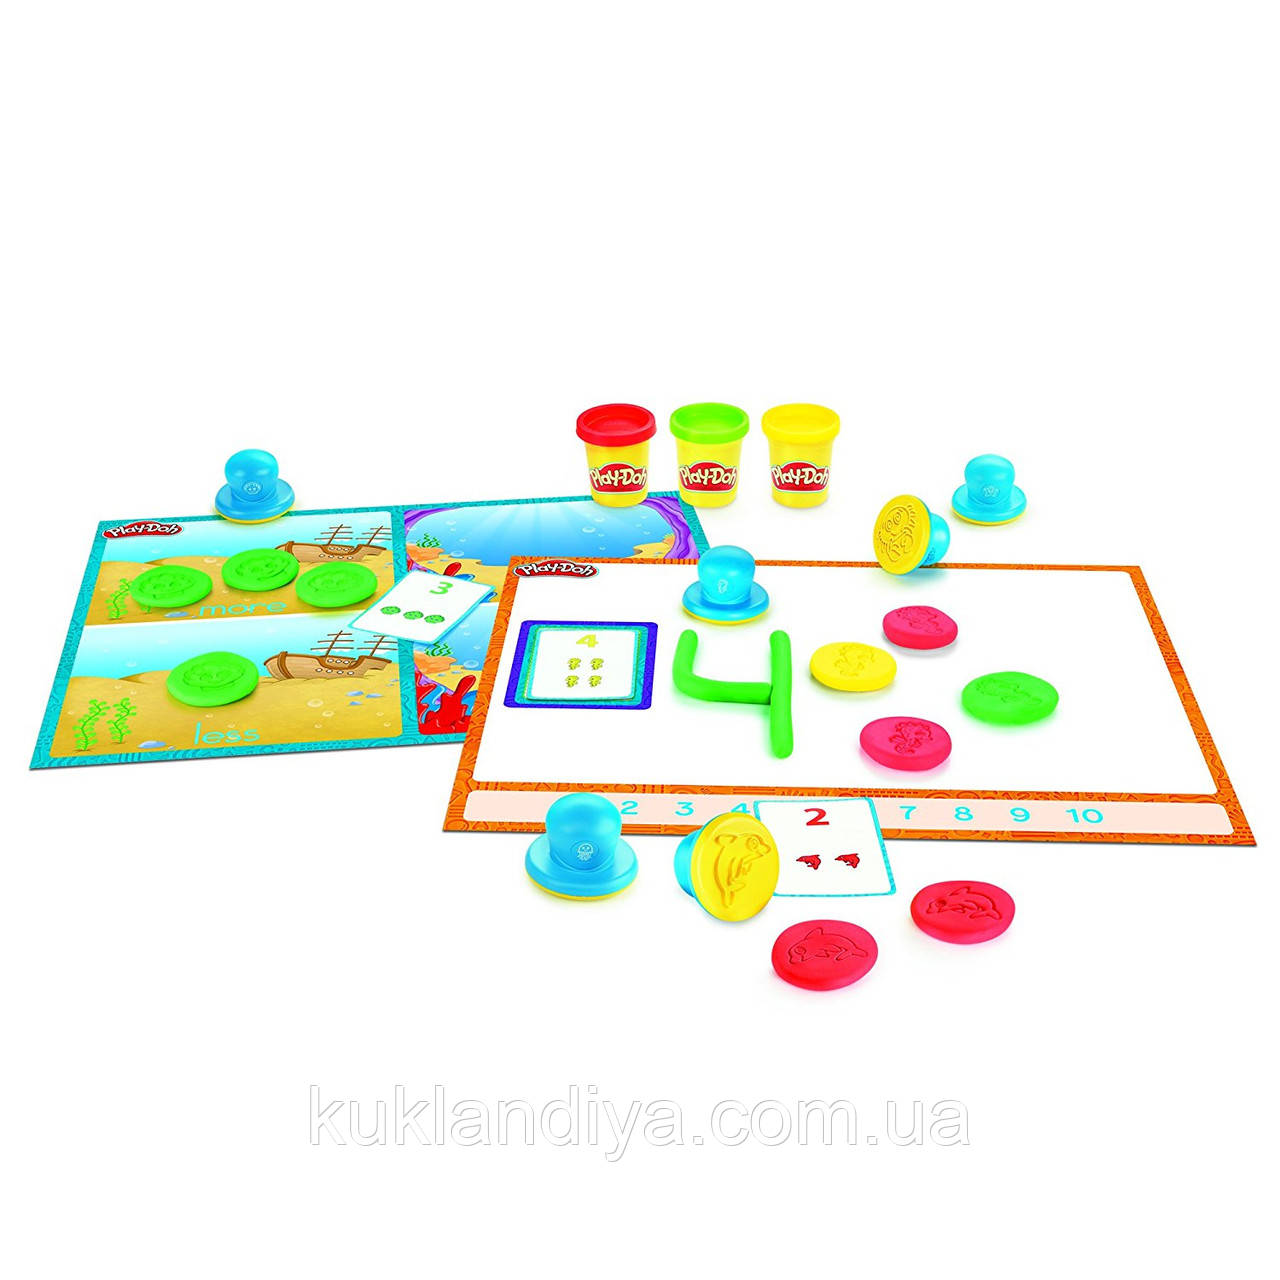 Набор Play-Doh изучаем цифры и счет